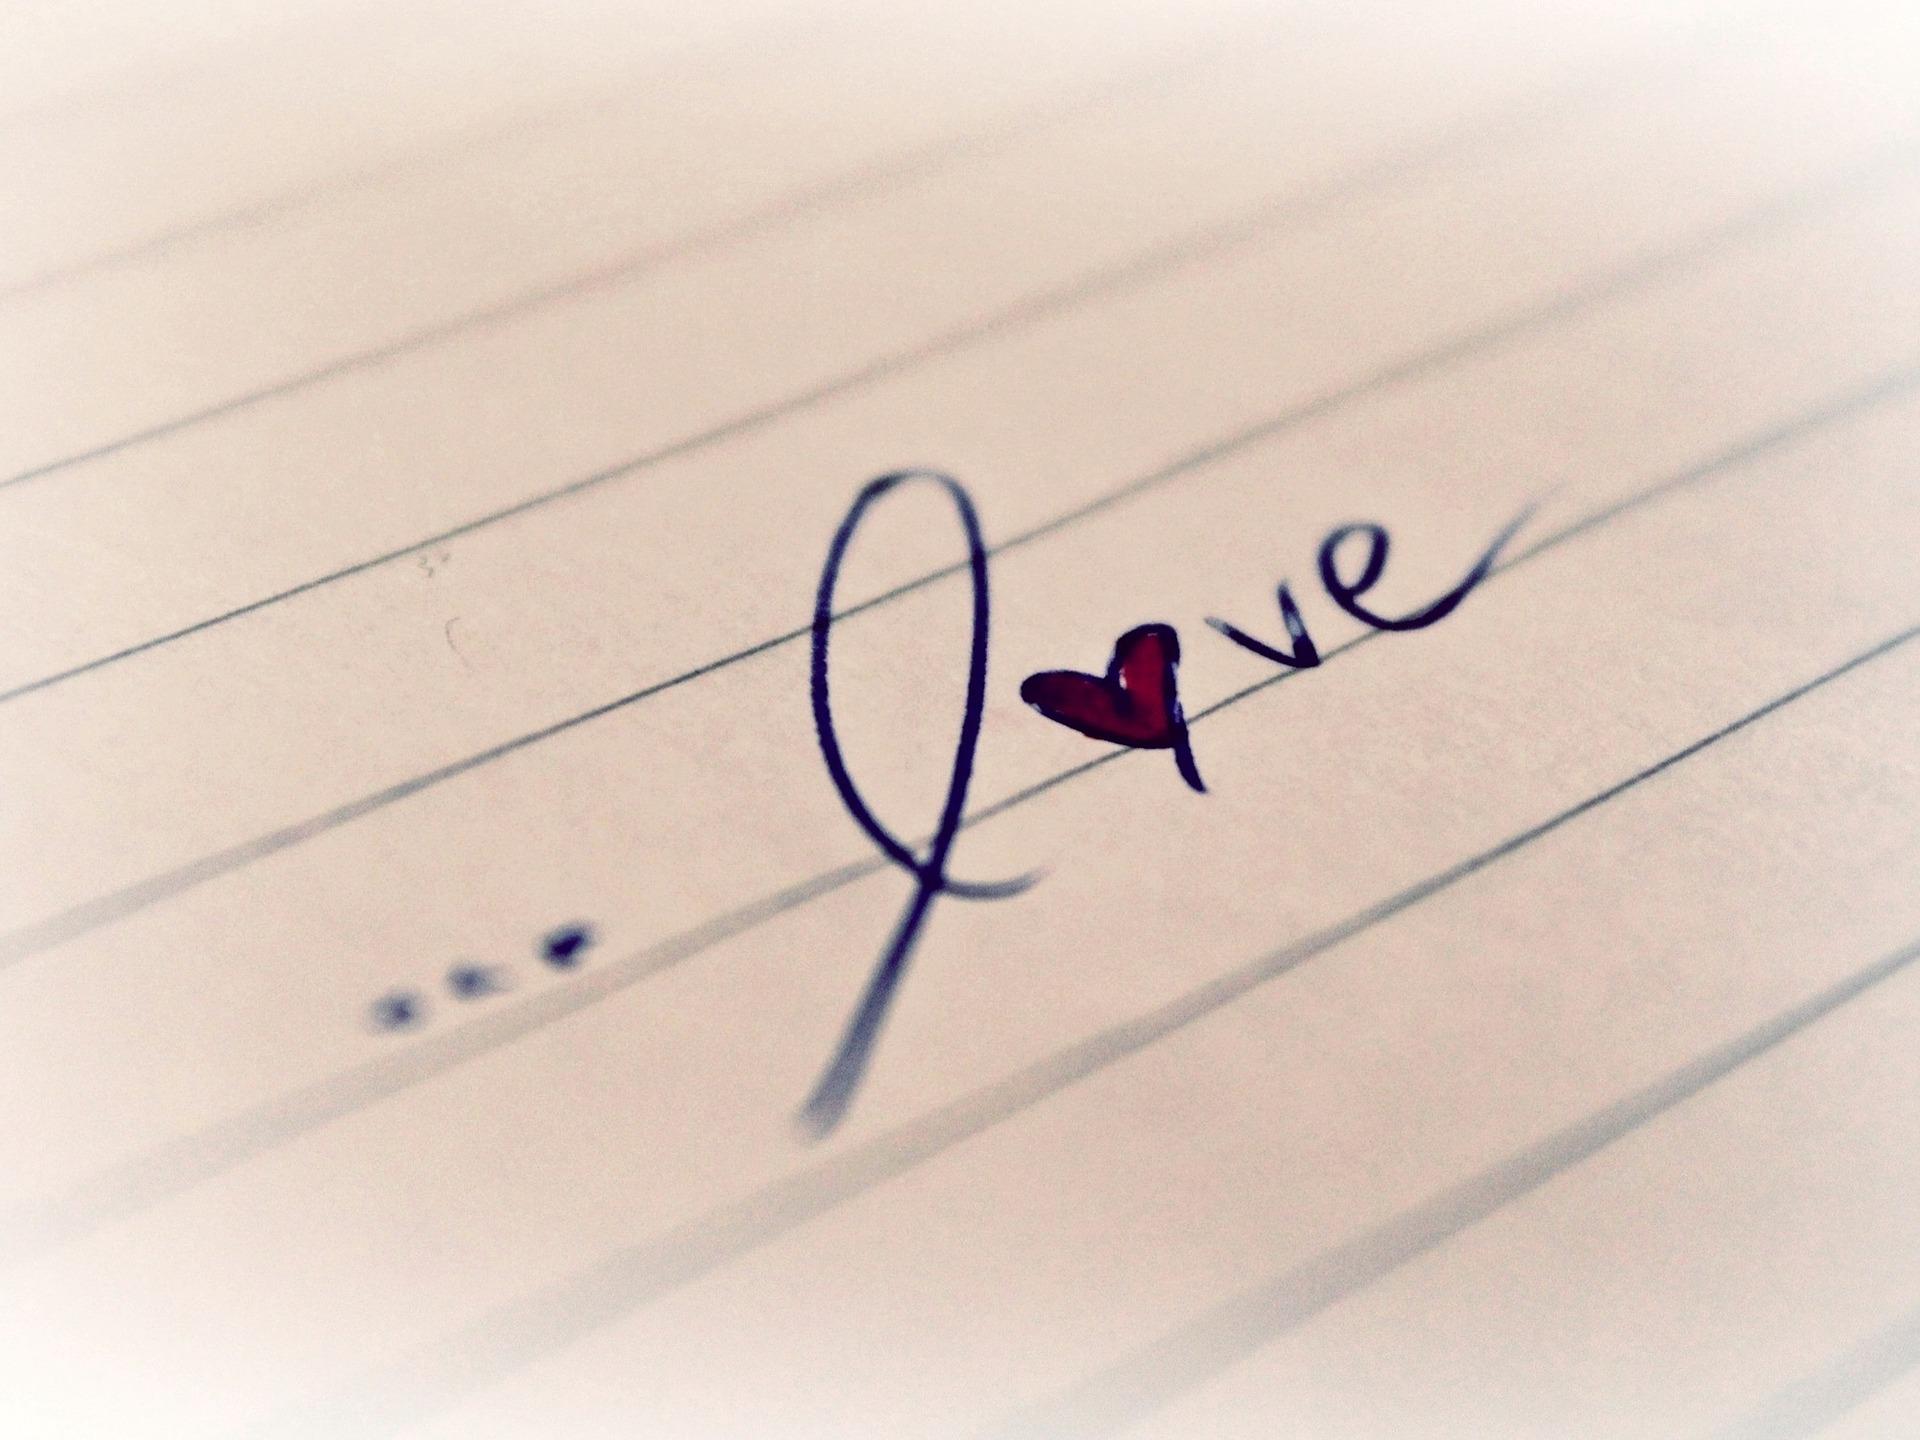 љубав